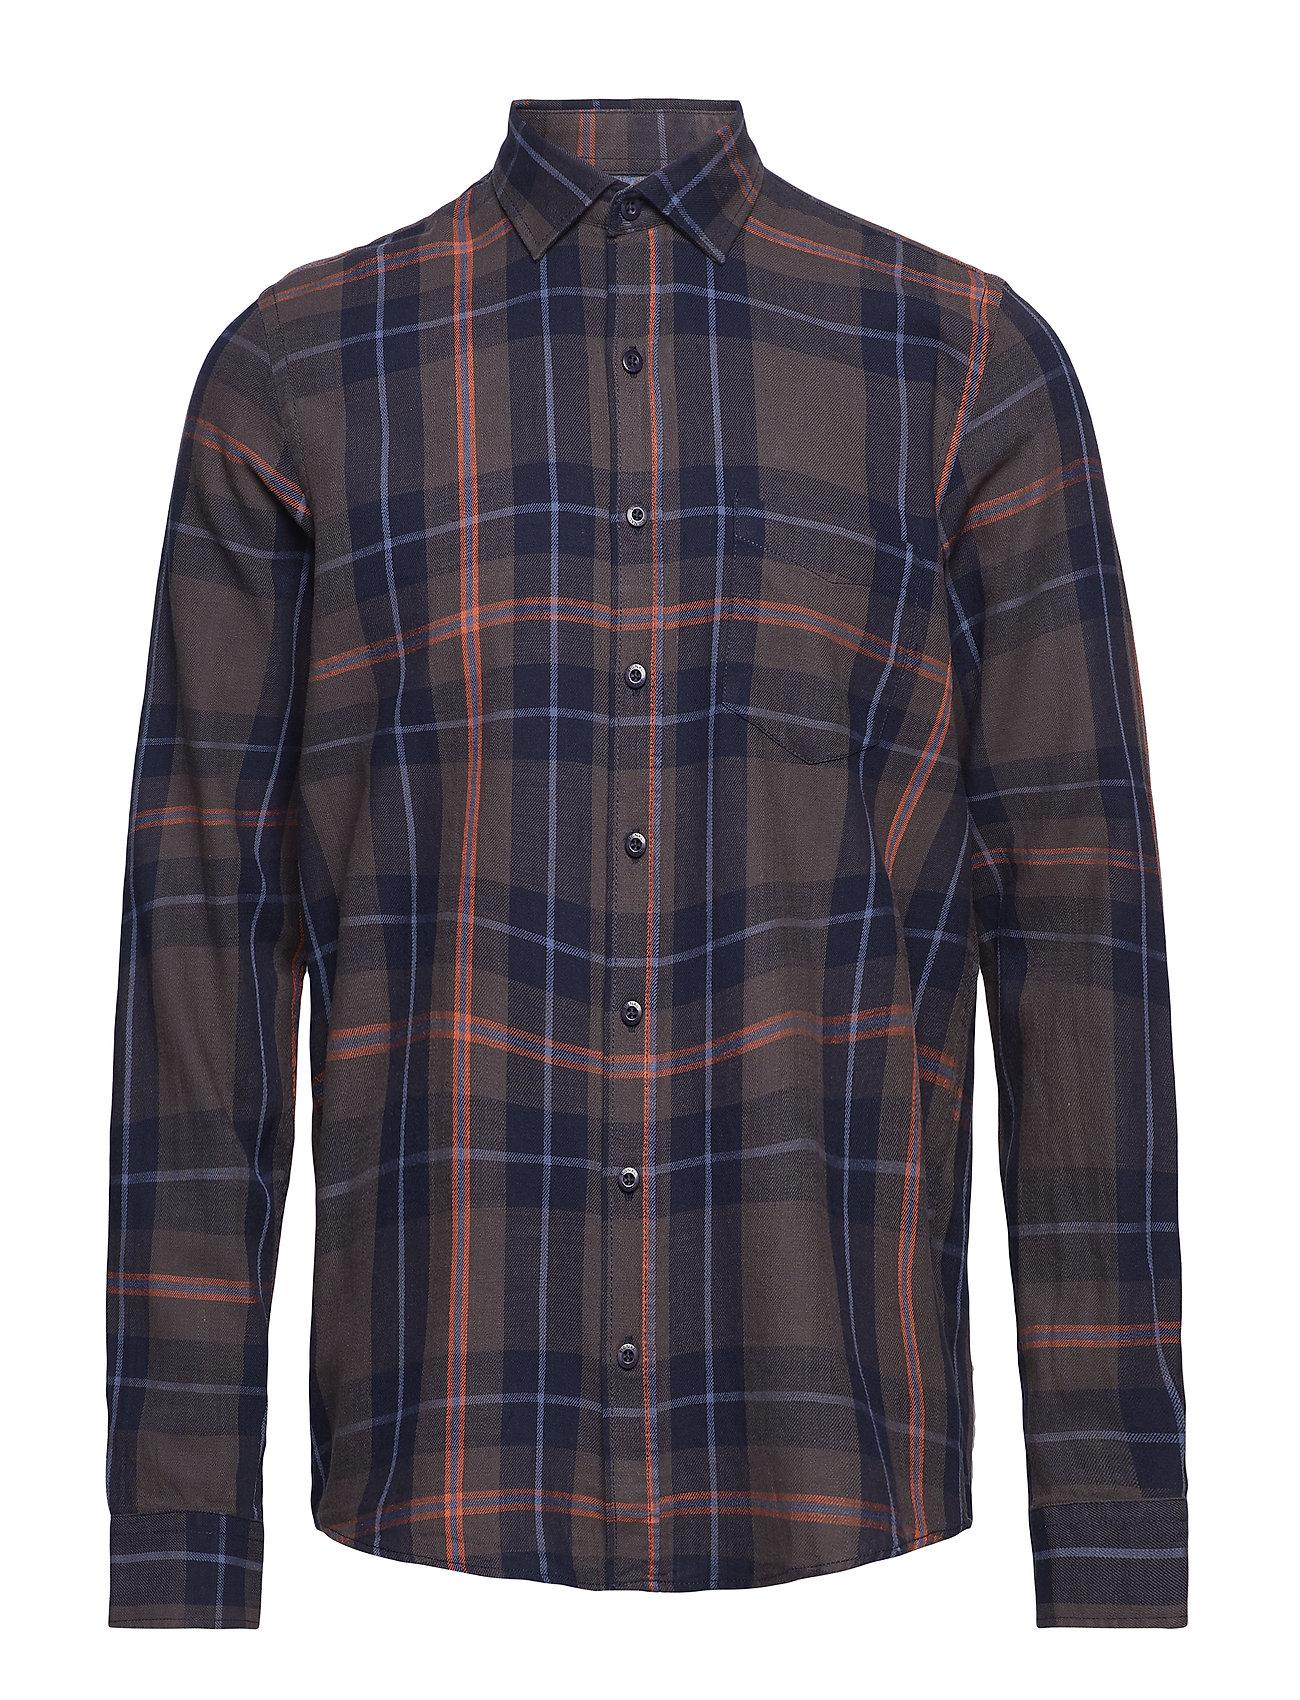 Signal L/S Shirts - BROWN LICORICE